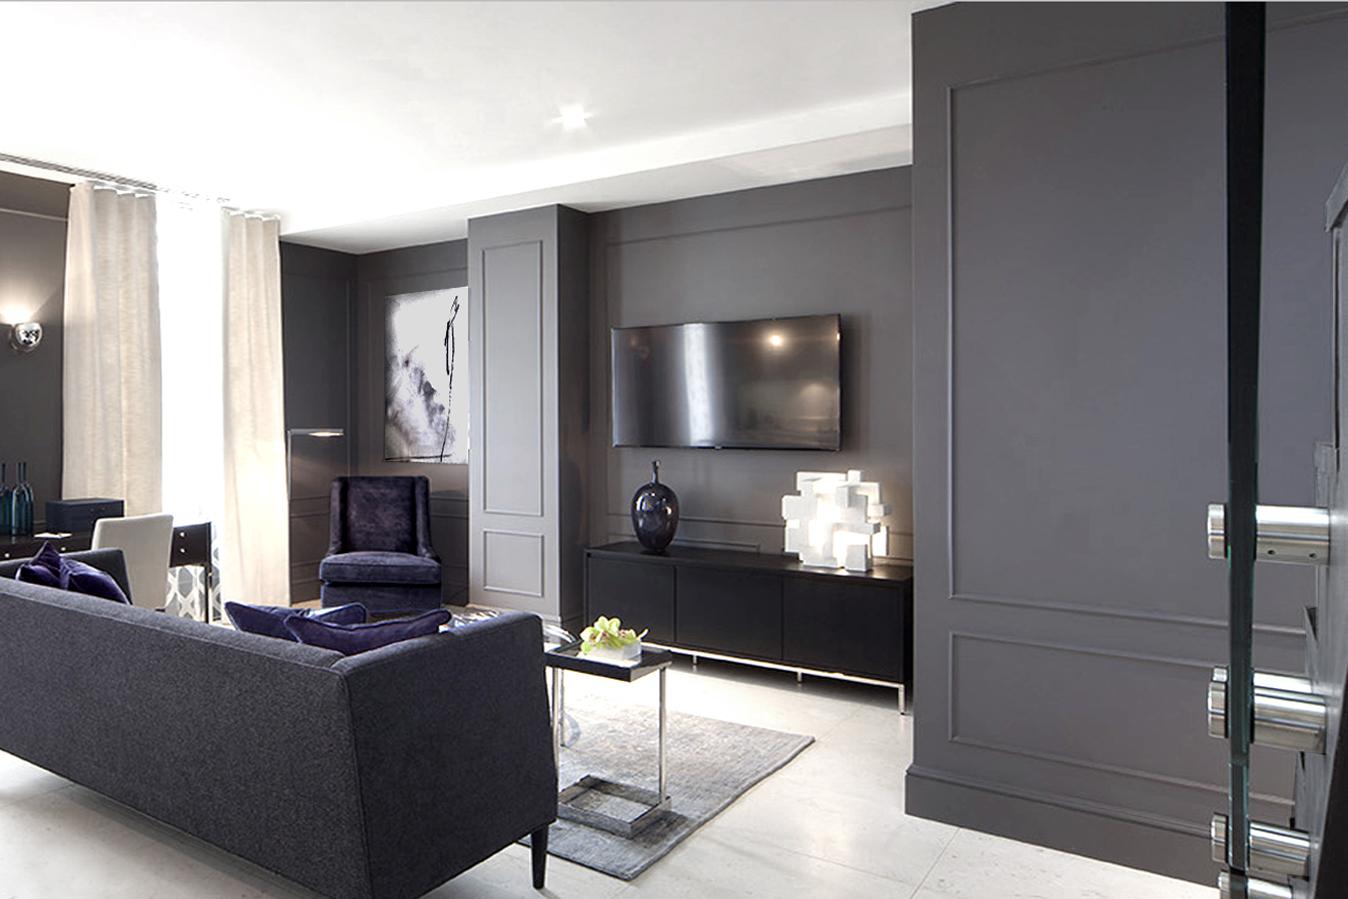 Luxury Interior Design in Westport, CT | Joe Ginsberg Design